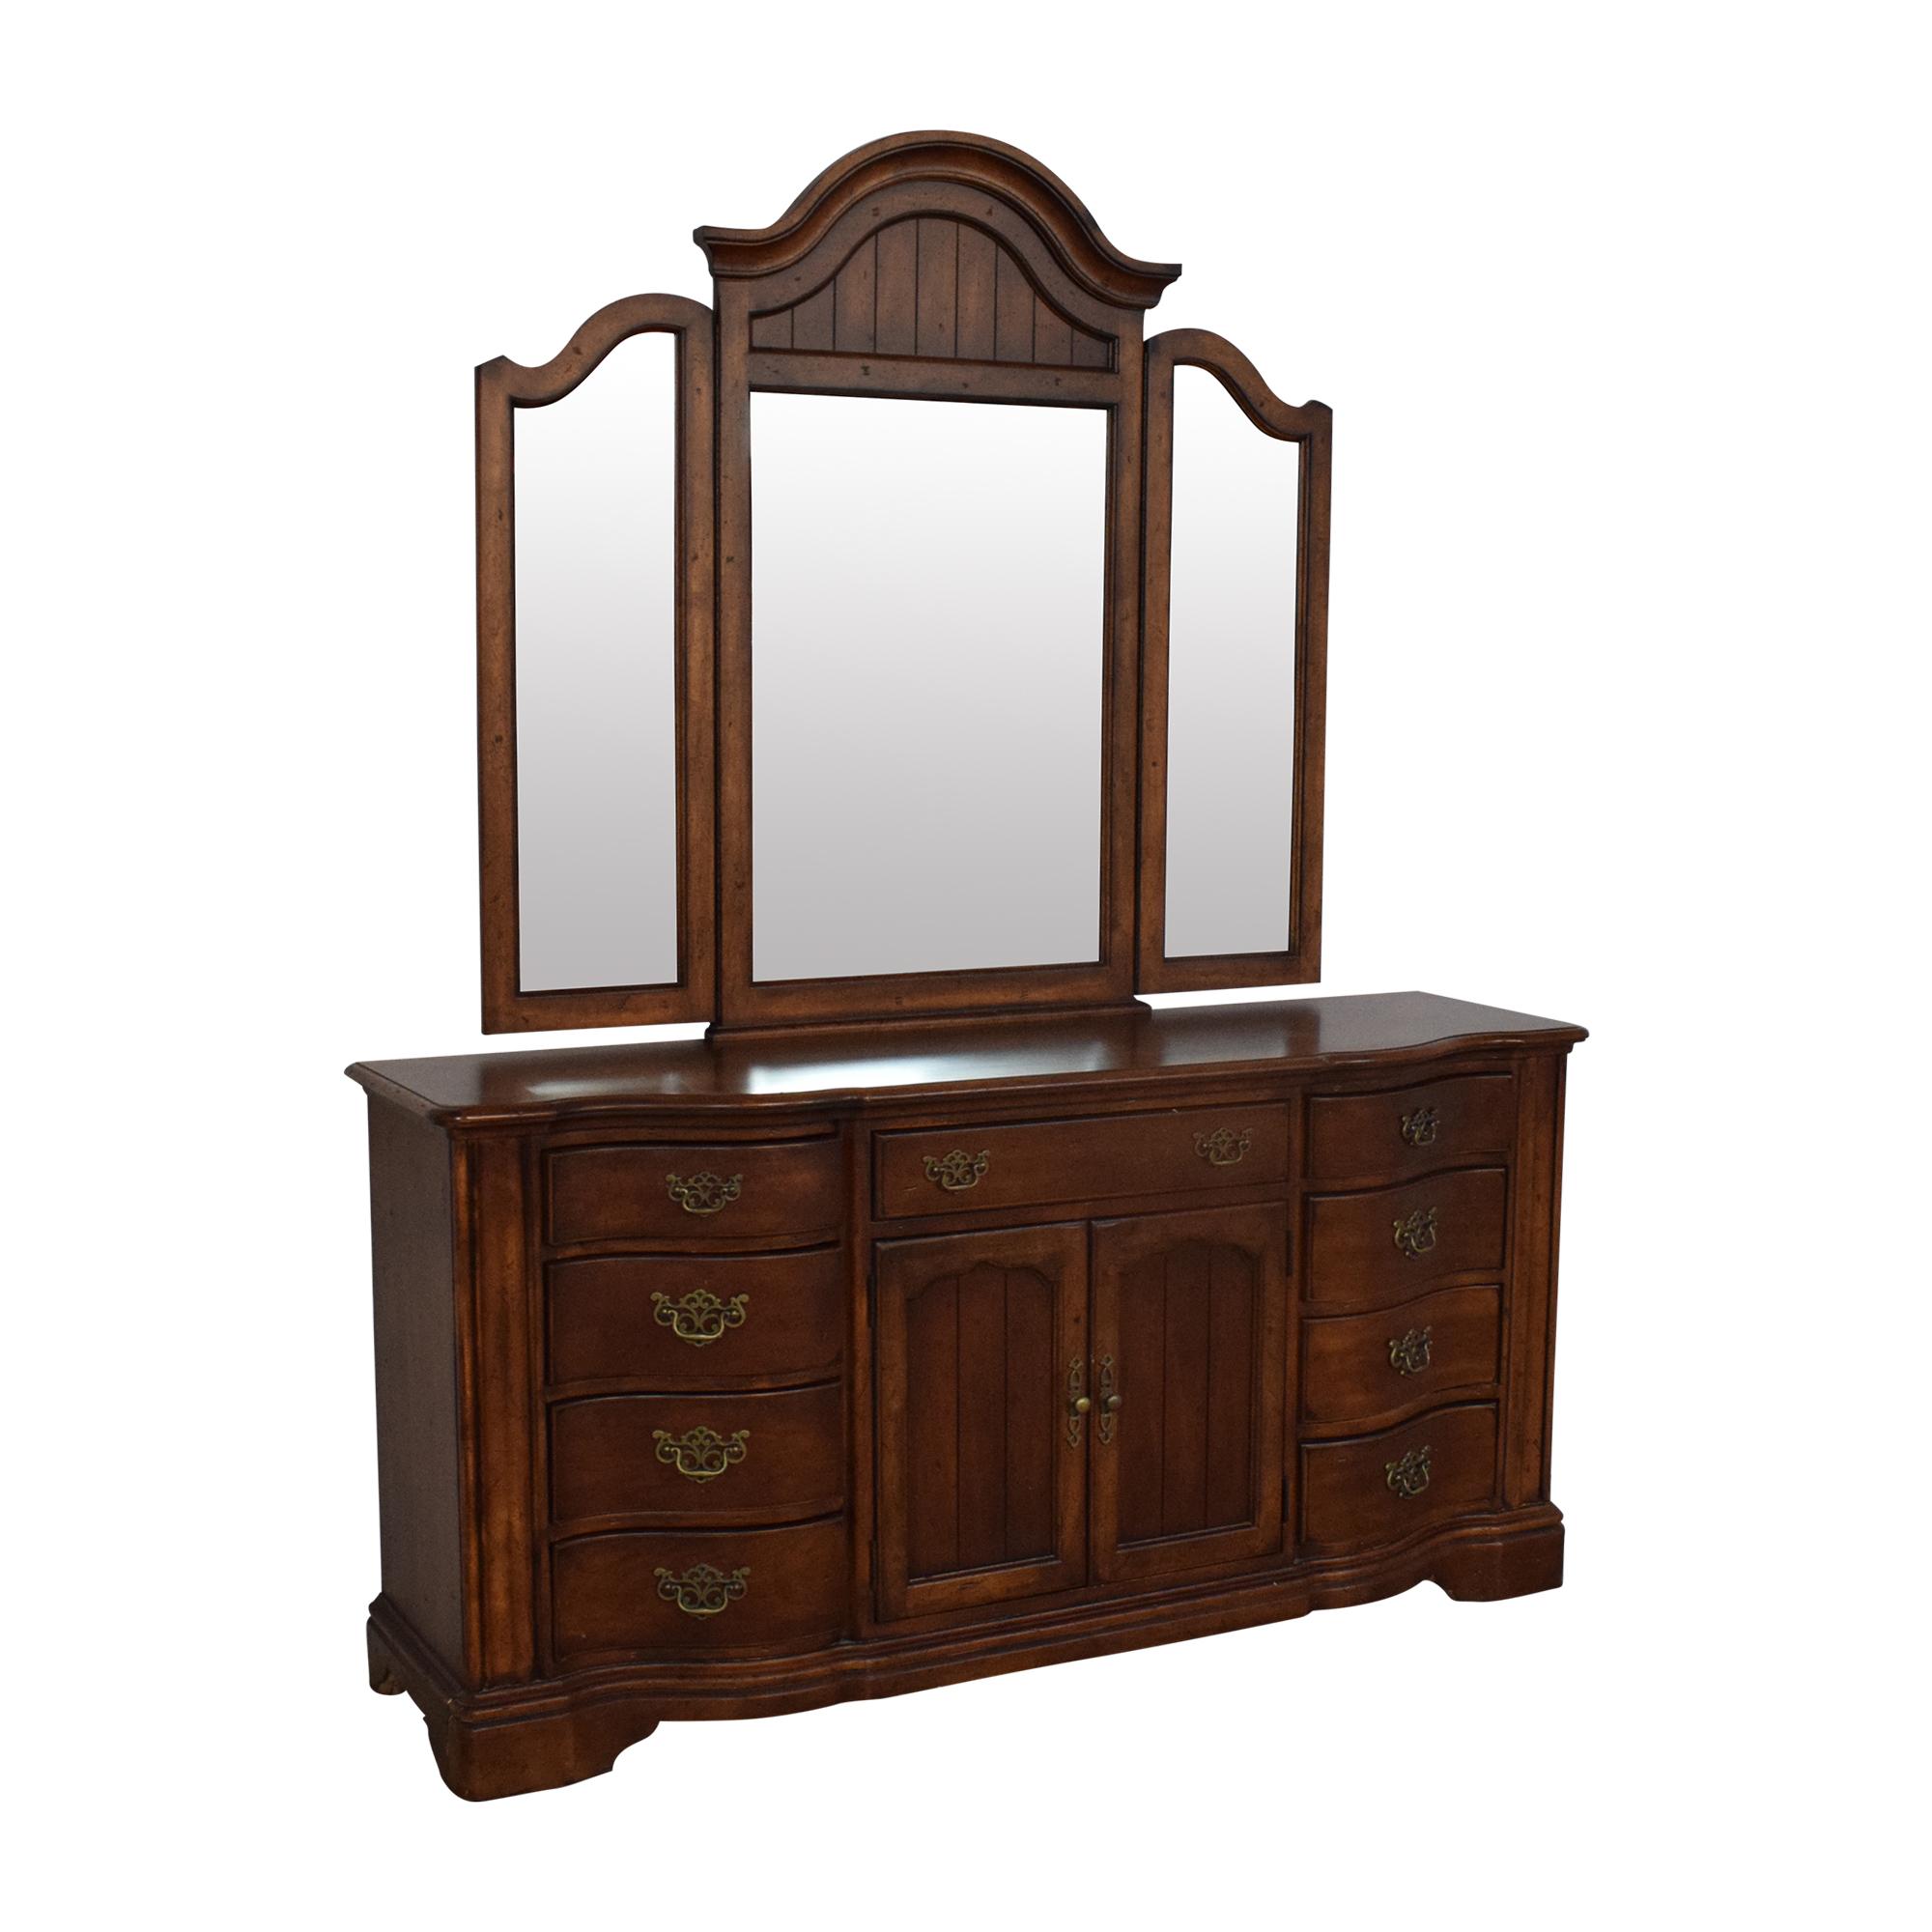 Universal Furniture Universal Furniture Dresser with Mirror ct